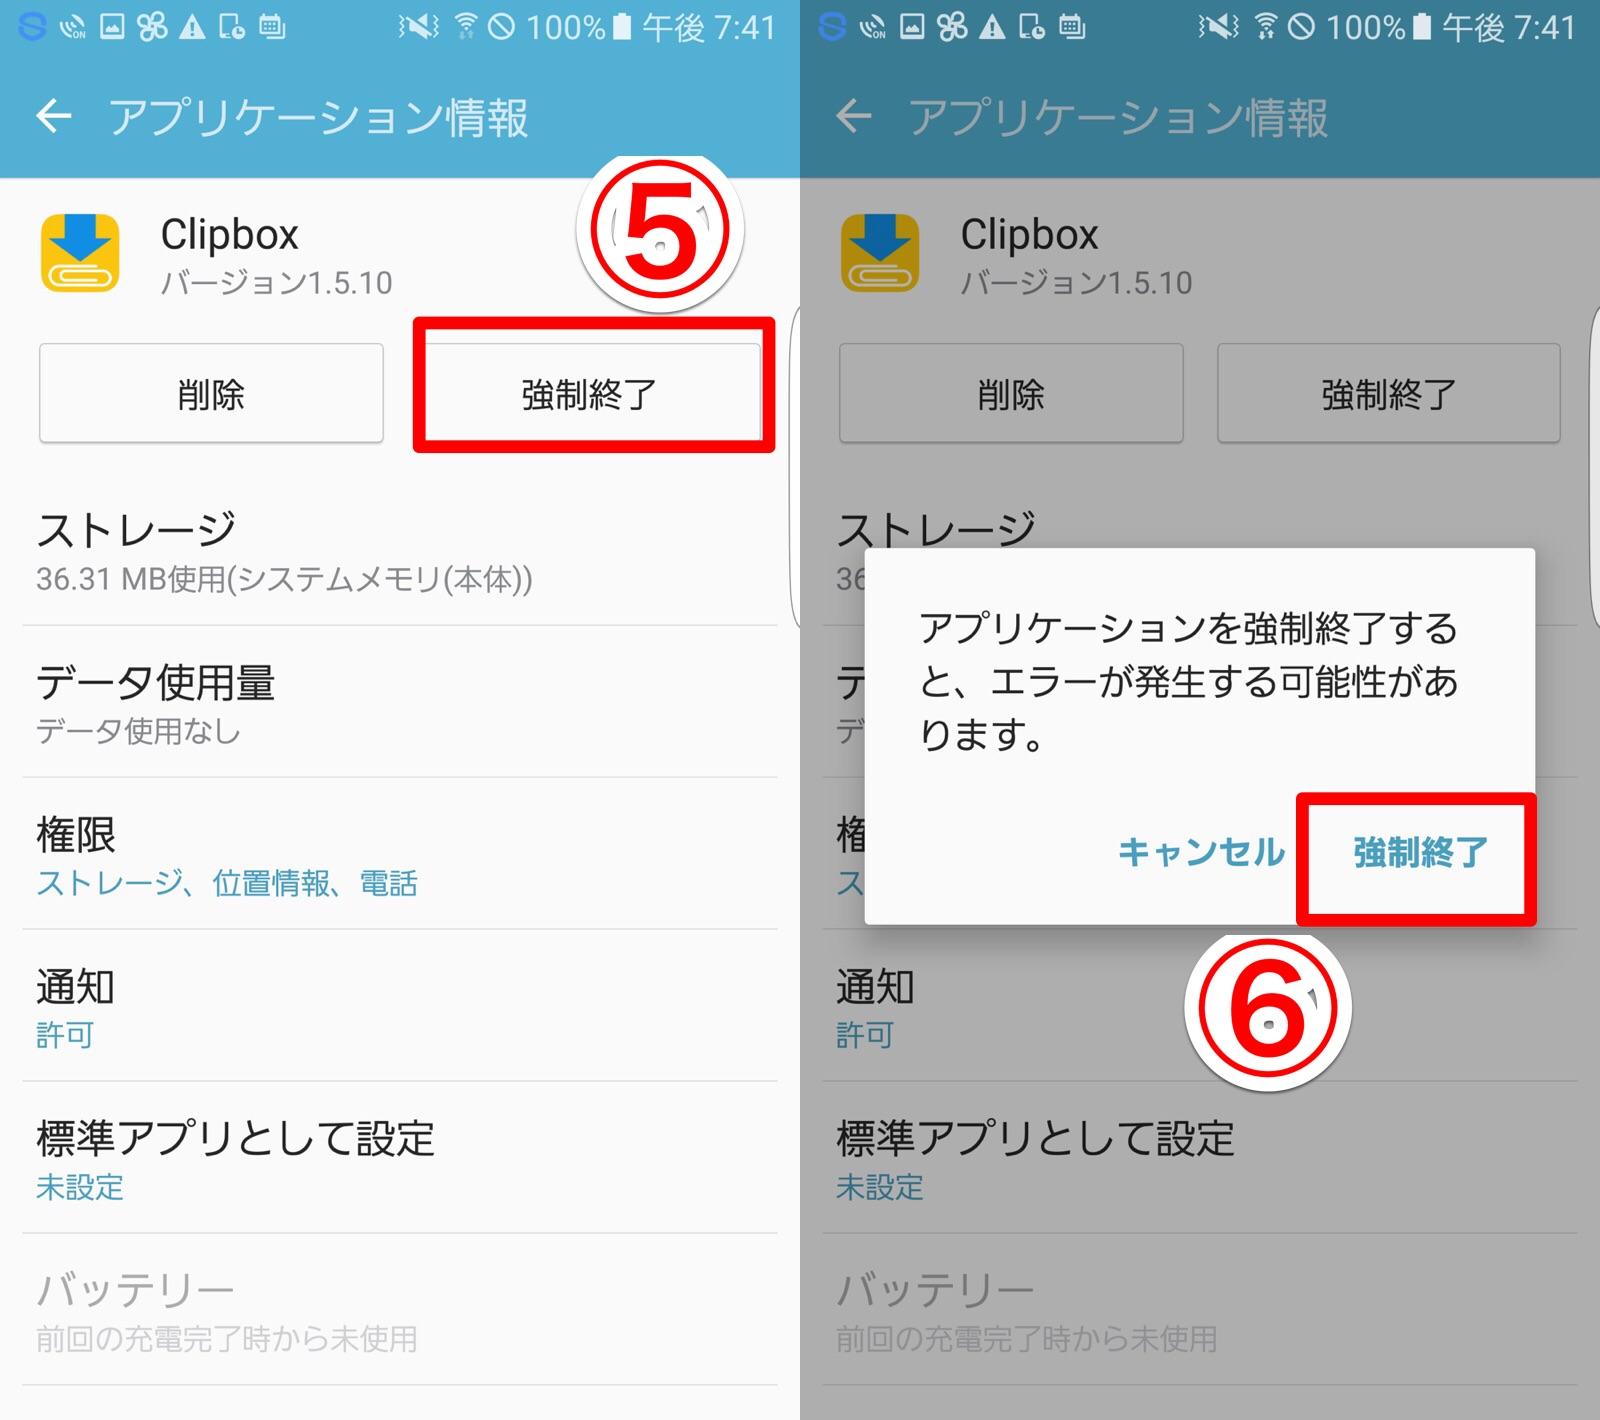 AndroidOS 6.0以降のデータ削除と強制終了の方法